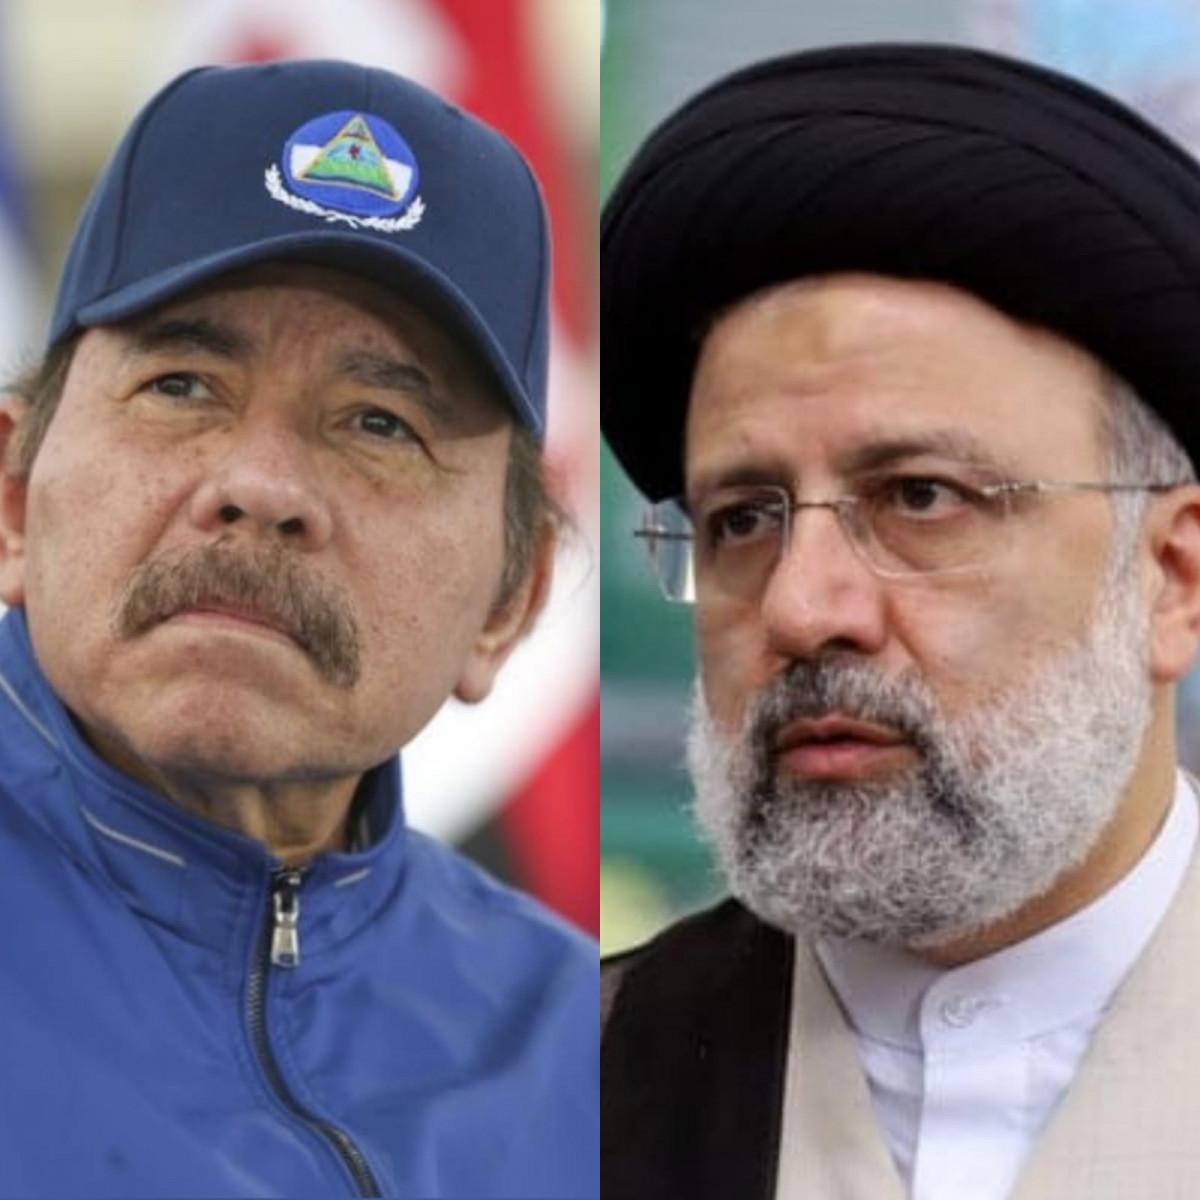 El presidente nicaragüense Daniel Ortega (izq) y el mandatario iraní Seyyed Ebrahim Raisi (der)